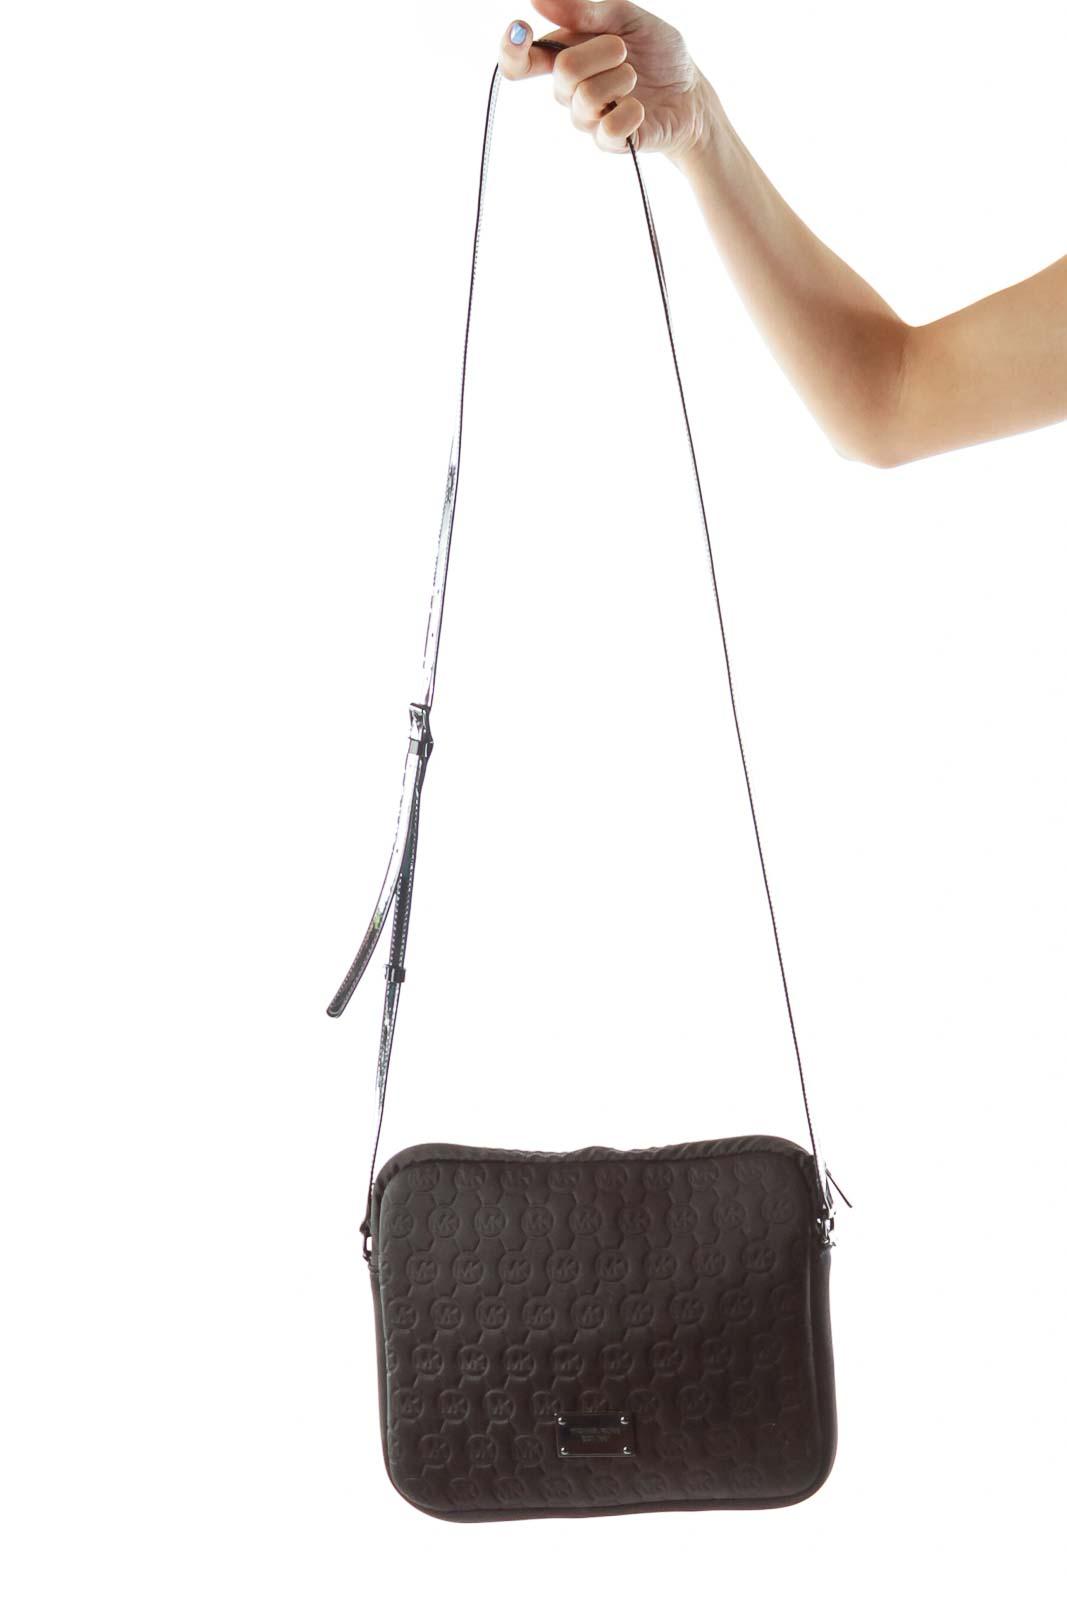 121f9151184 Shop Black Embossed Crossbody Bag clothing and handbags at SilkRoll ...